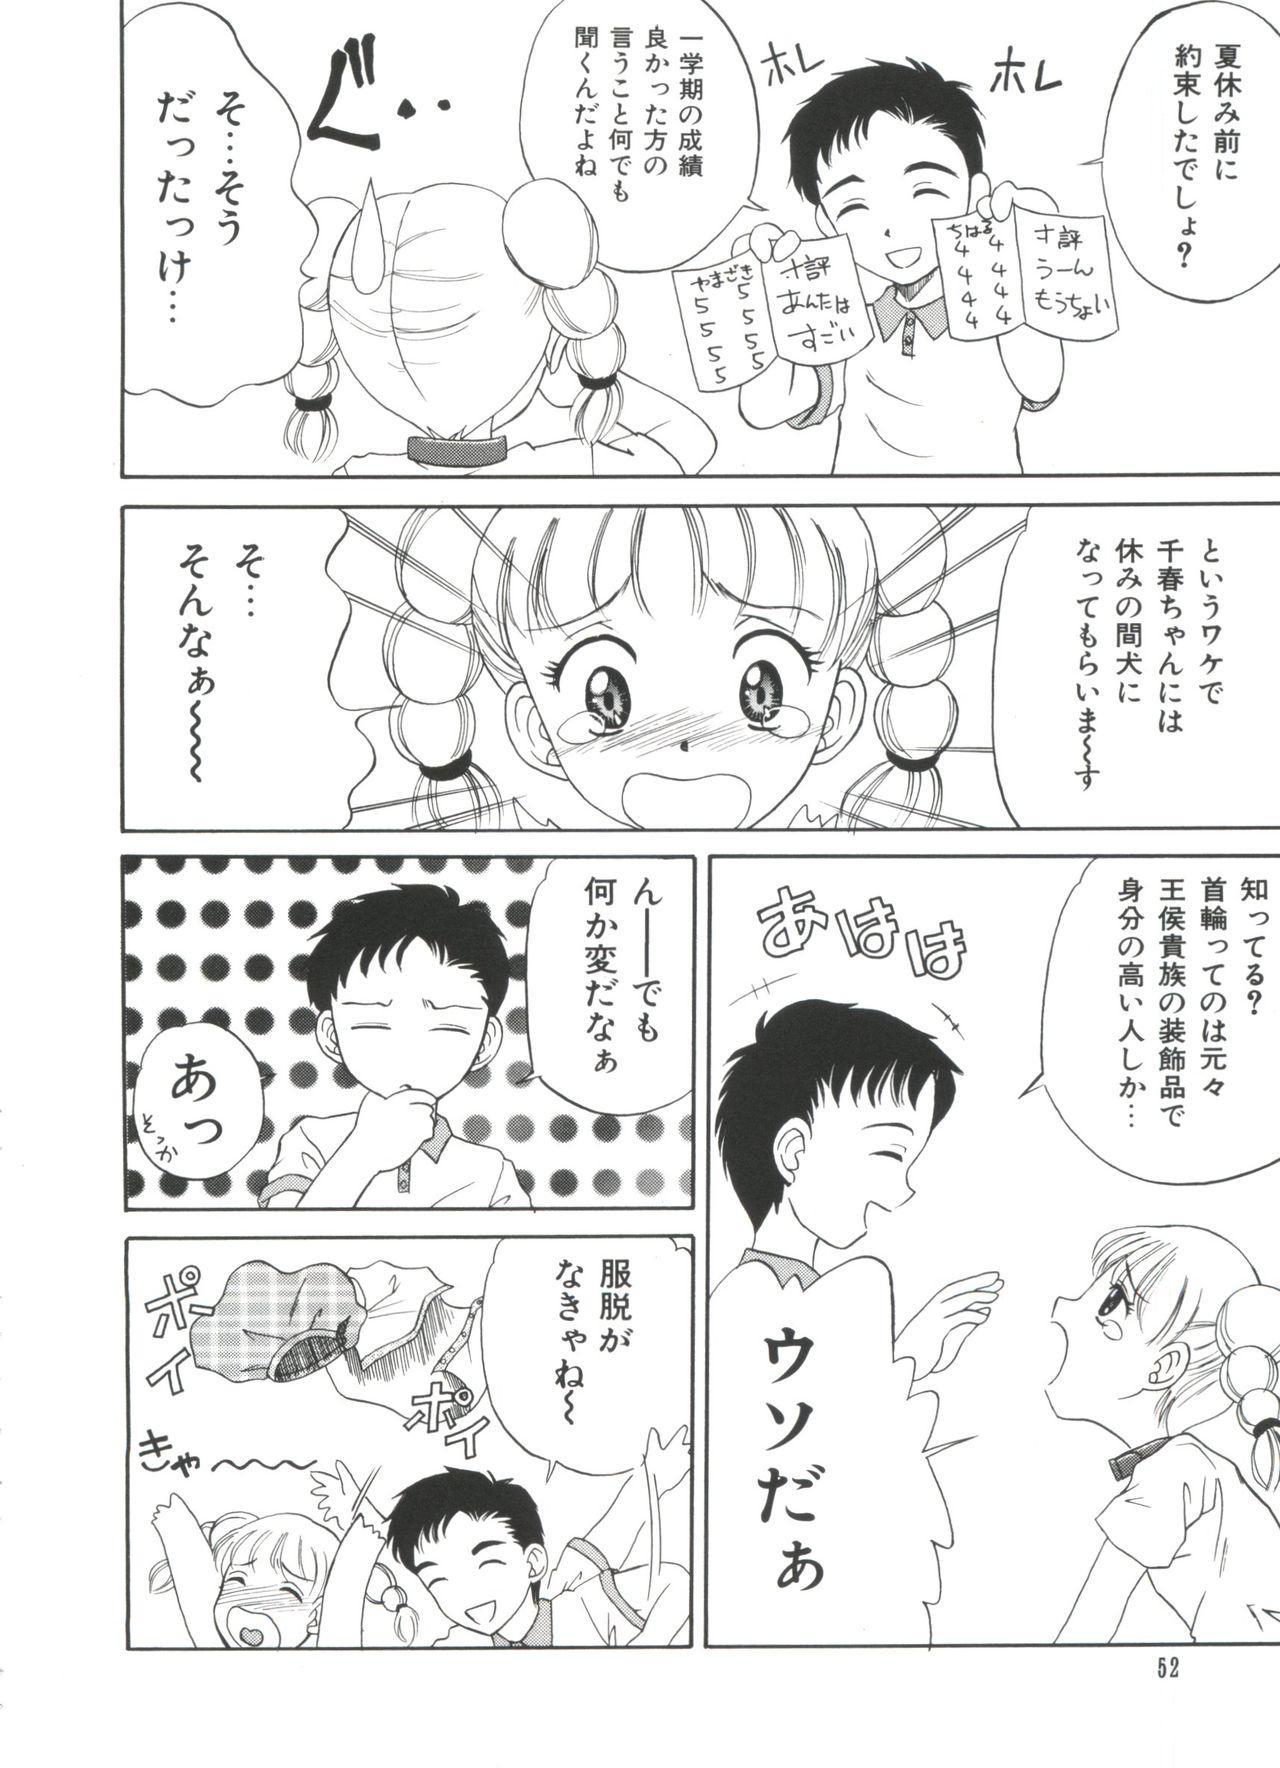 Ero-chan to Issho 2 53